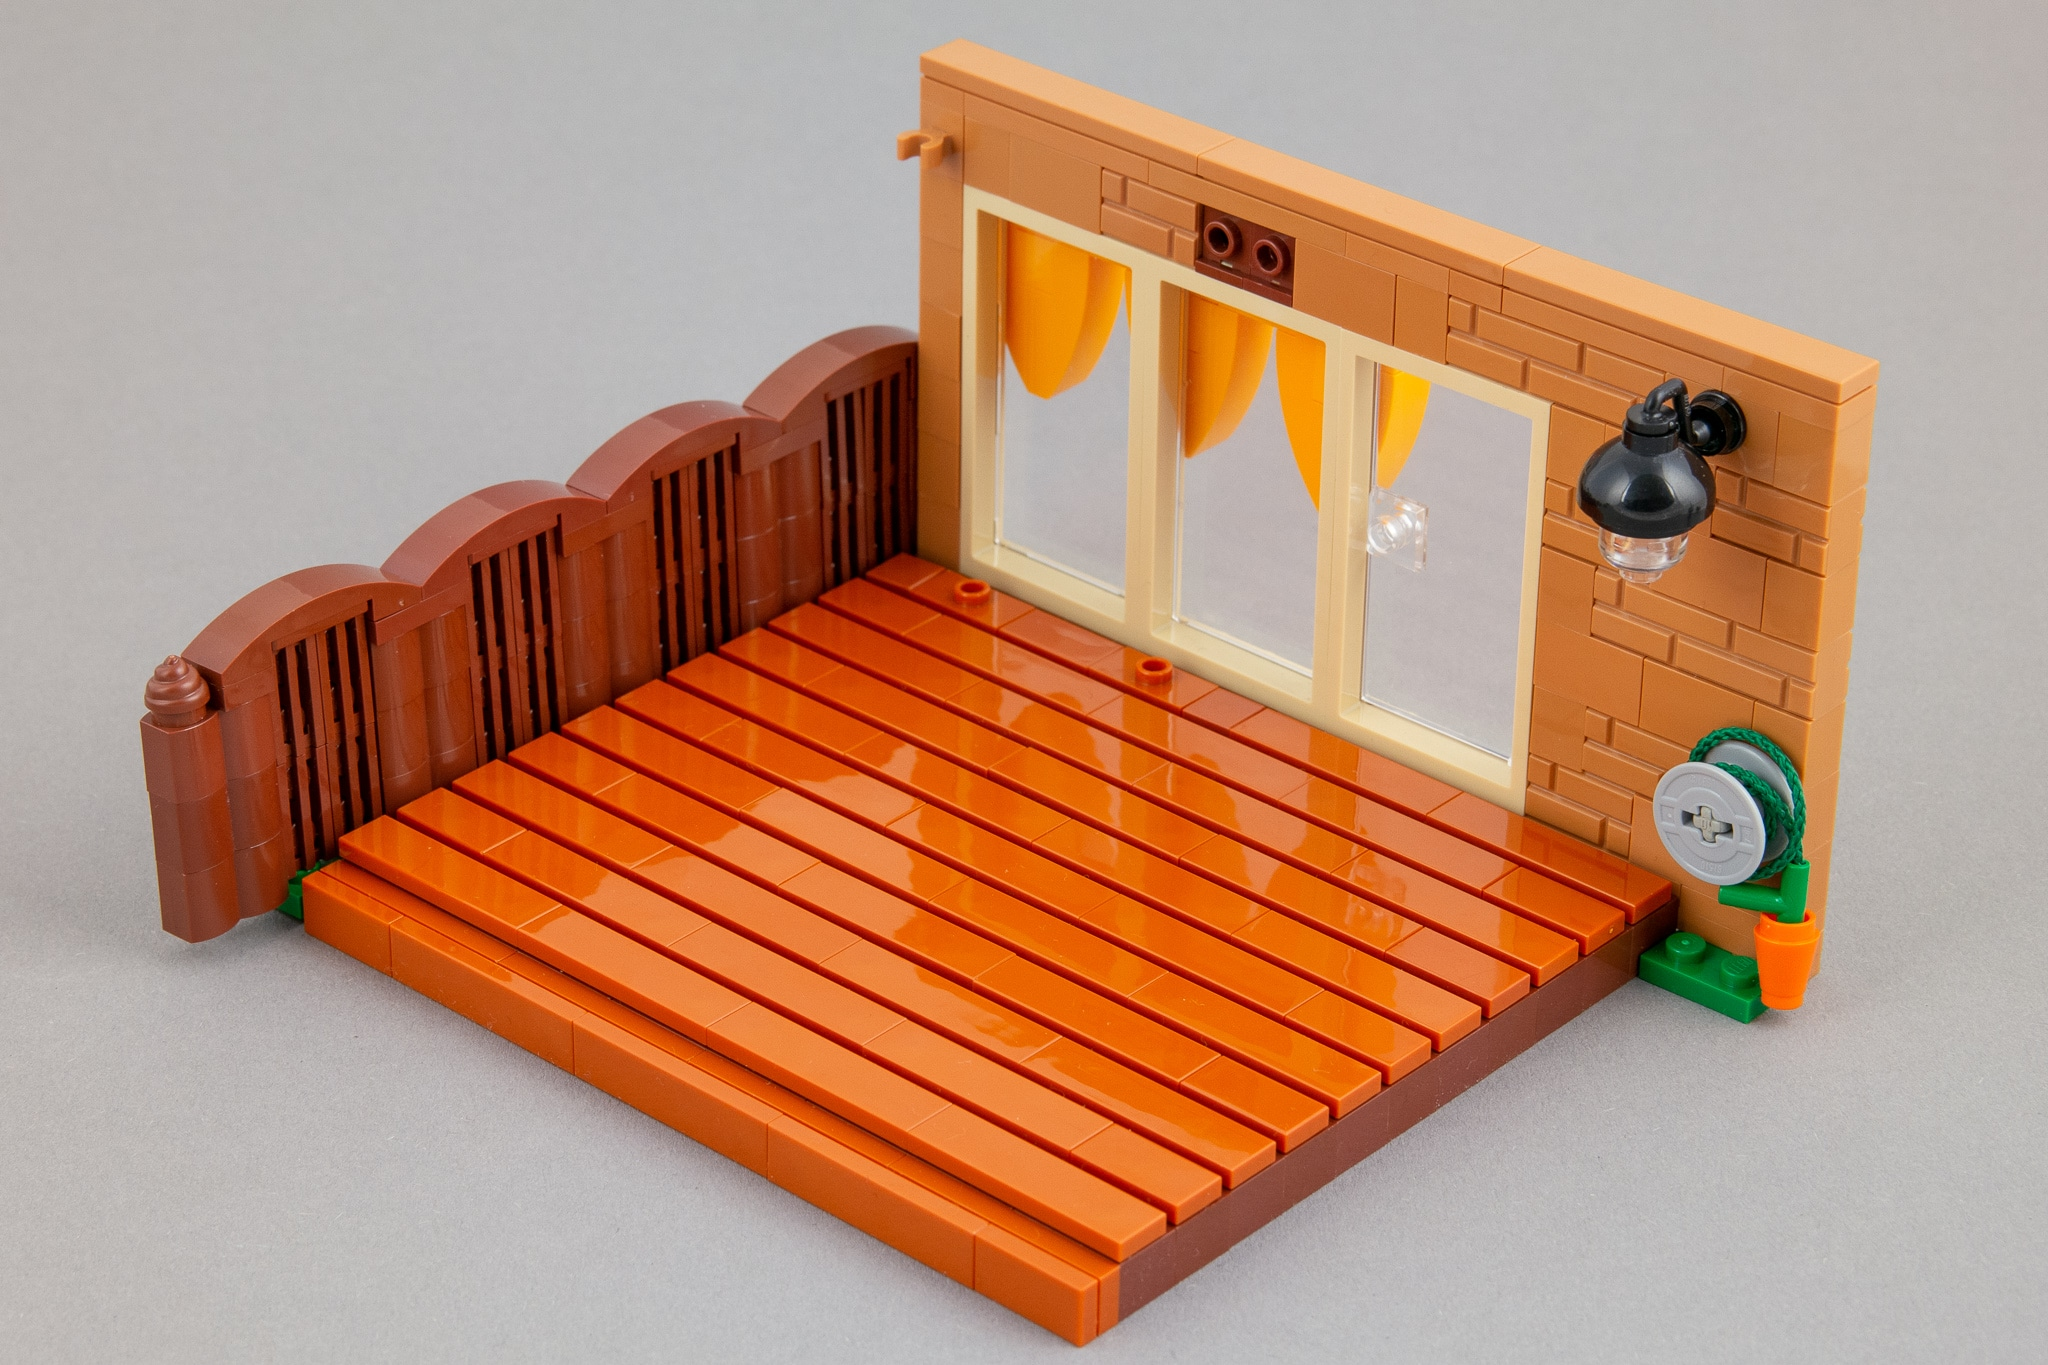 LEGO Terrasse Moc Grillen (21)